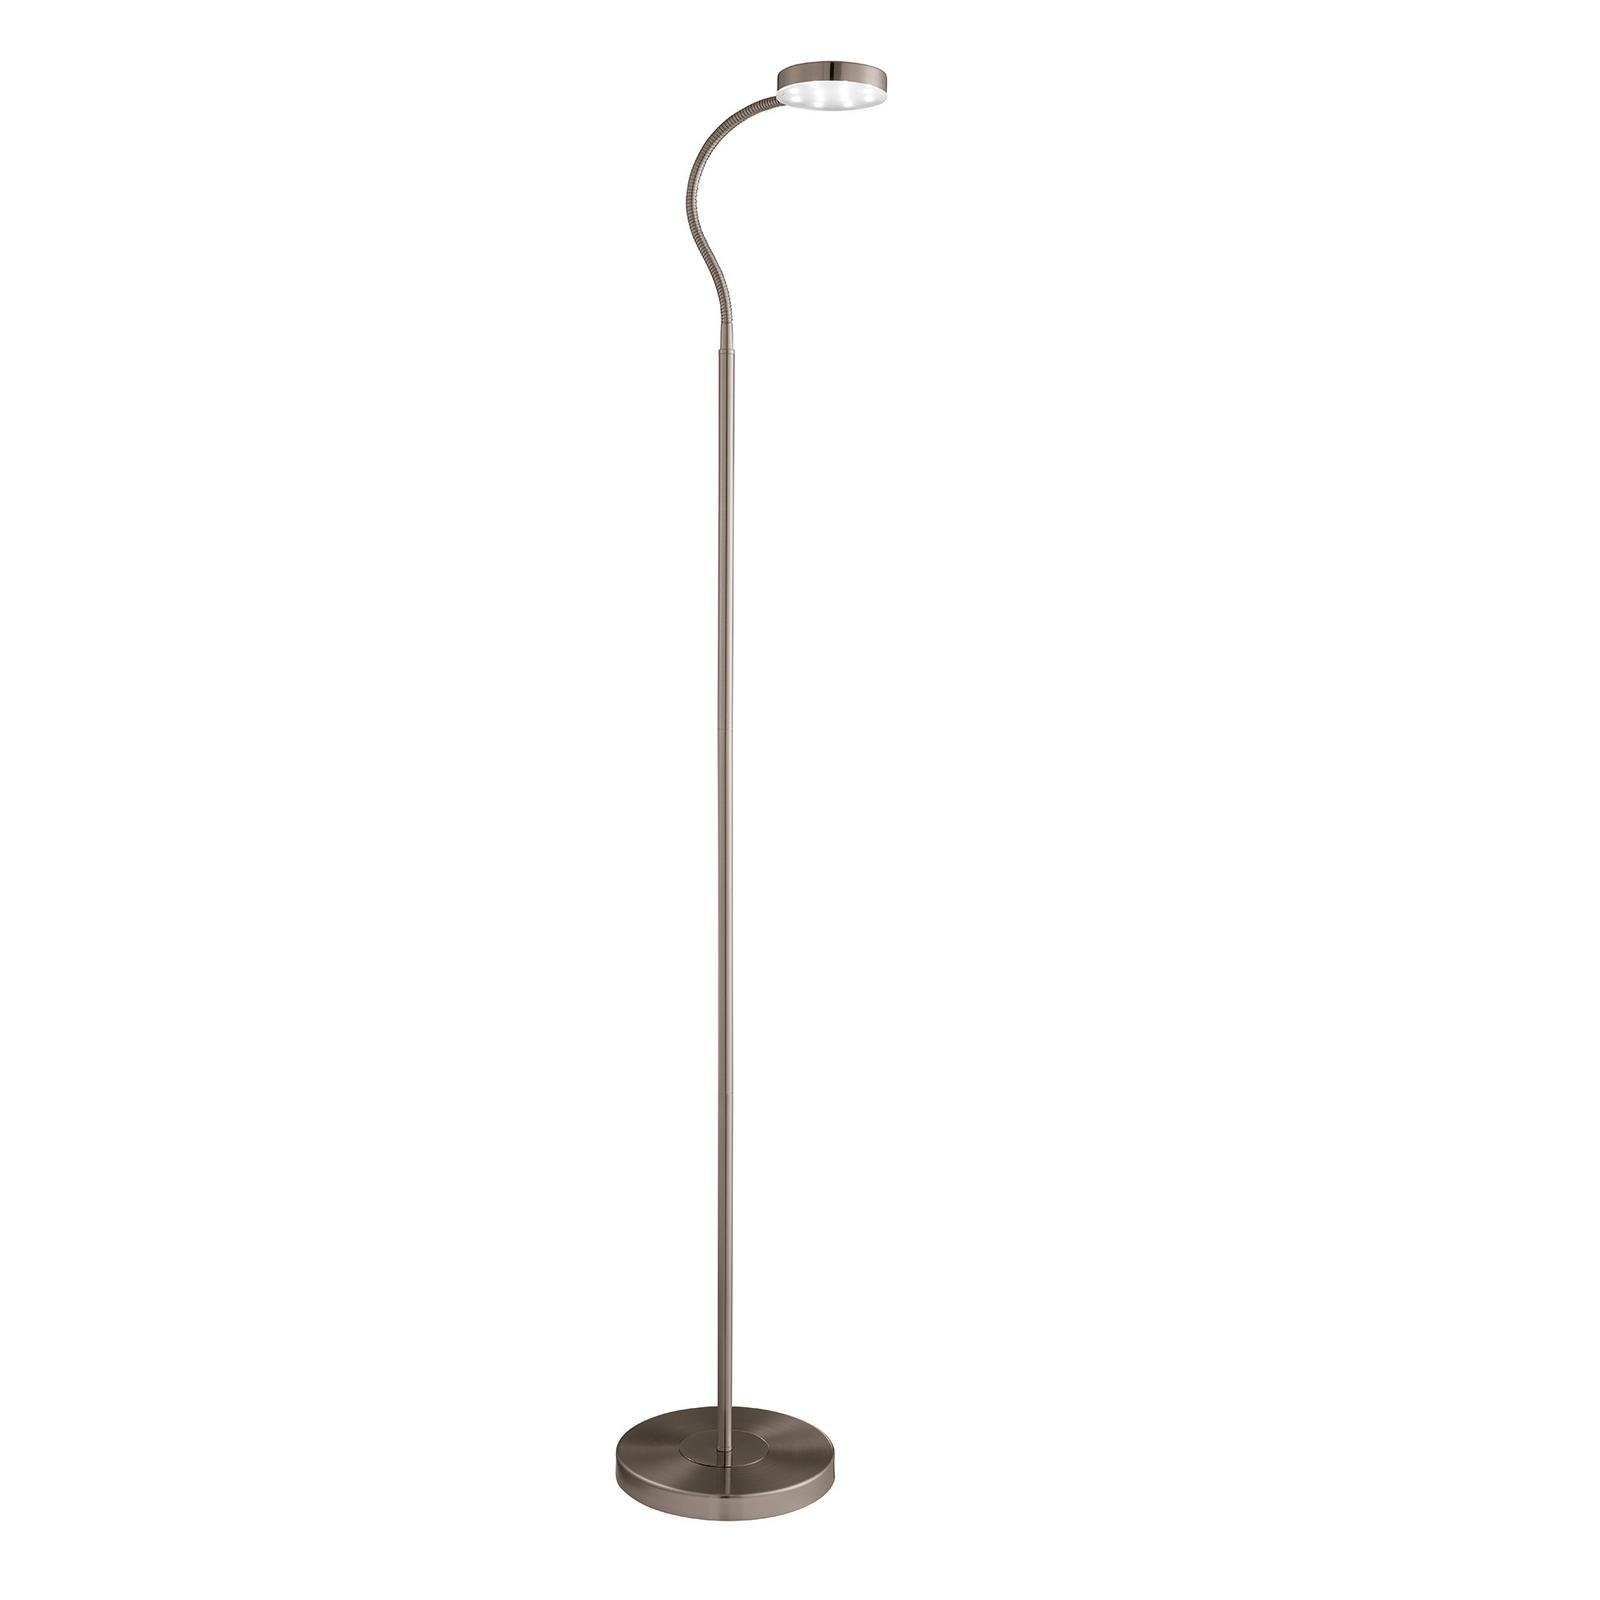 ADJUSTABLE LED ANTIQUE BRASS ROUND HEAD FLOOR LAMP